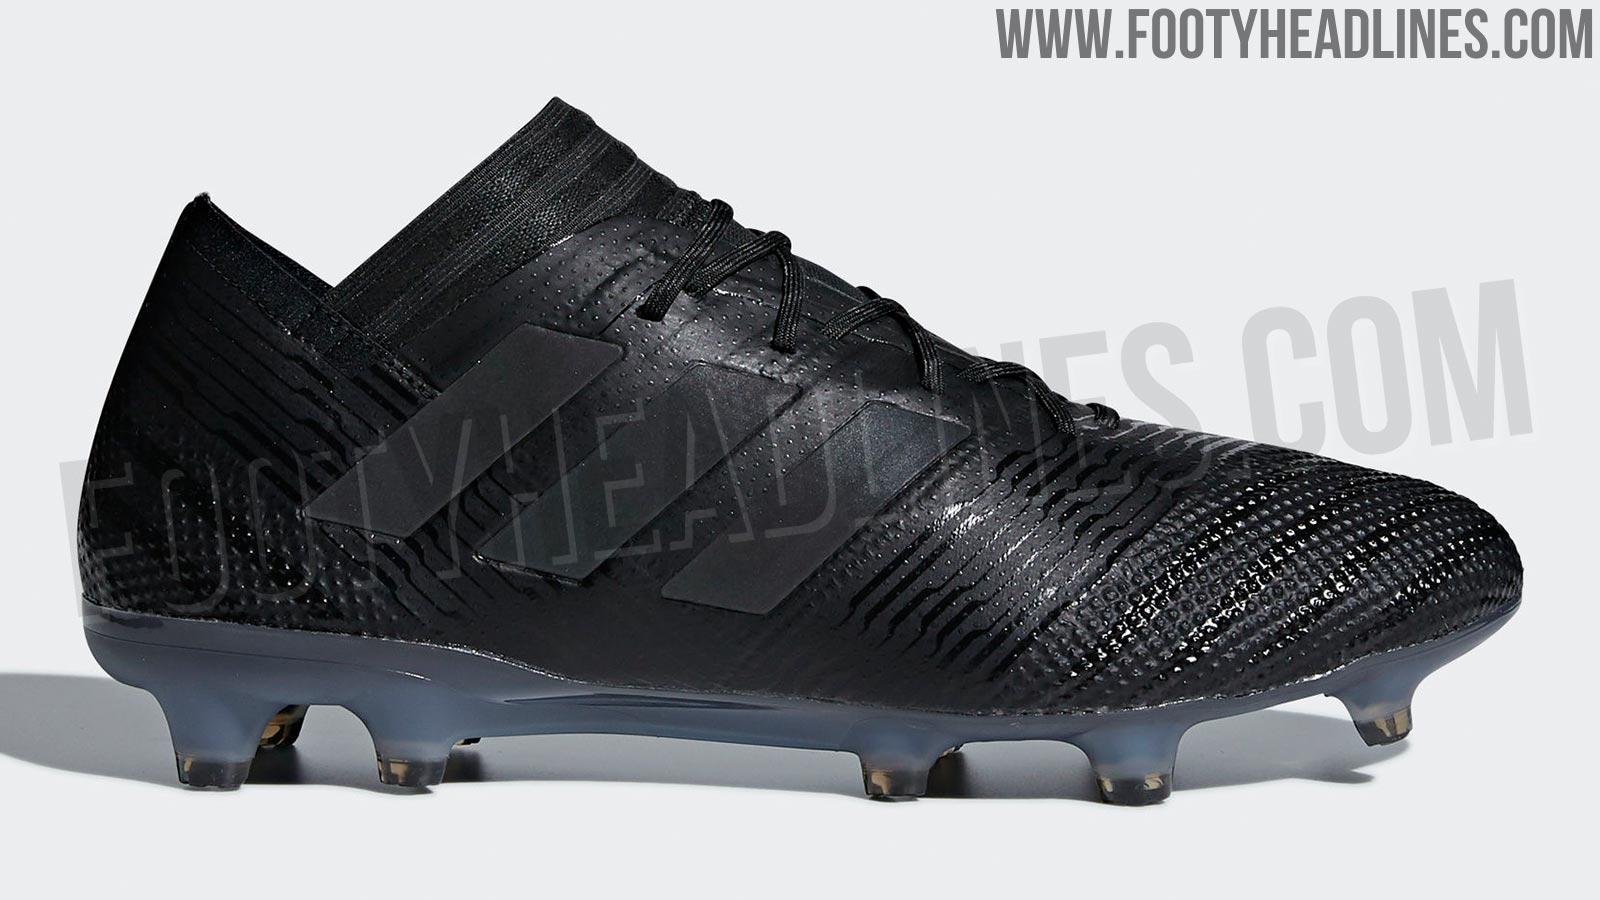 nemeziz adidas nepal nemeziz adidas soccer cleats Défi J'arrête, j